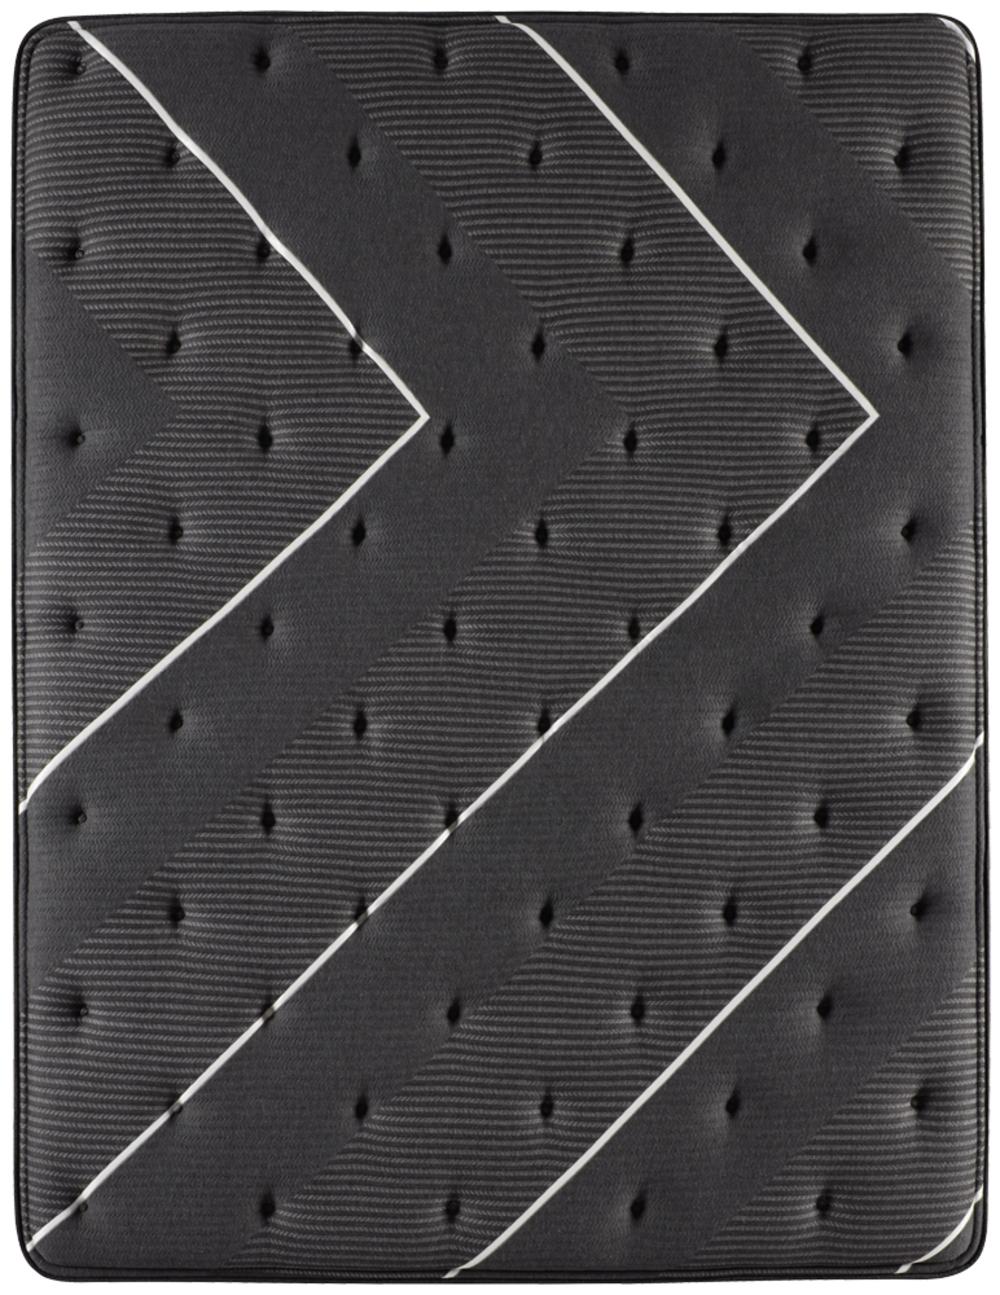 Beautyrest - BR Black C Class Medium PT Mattress with BR Black Luxury Motion Base